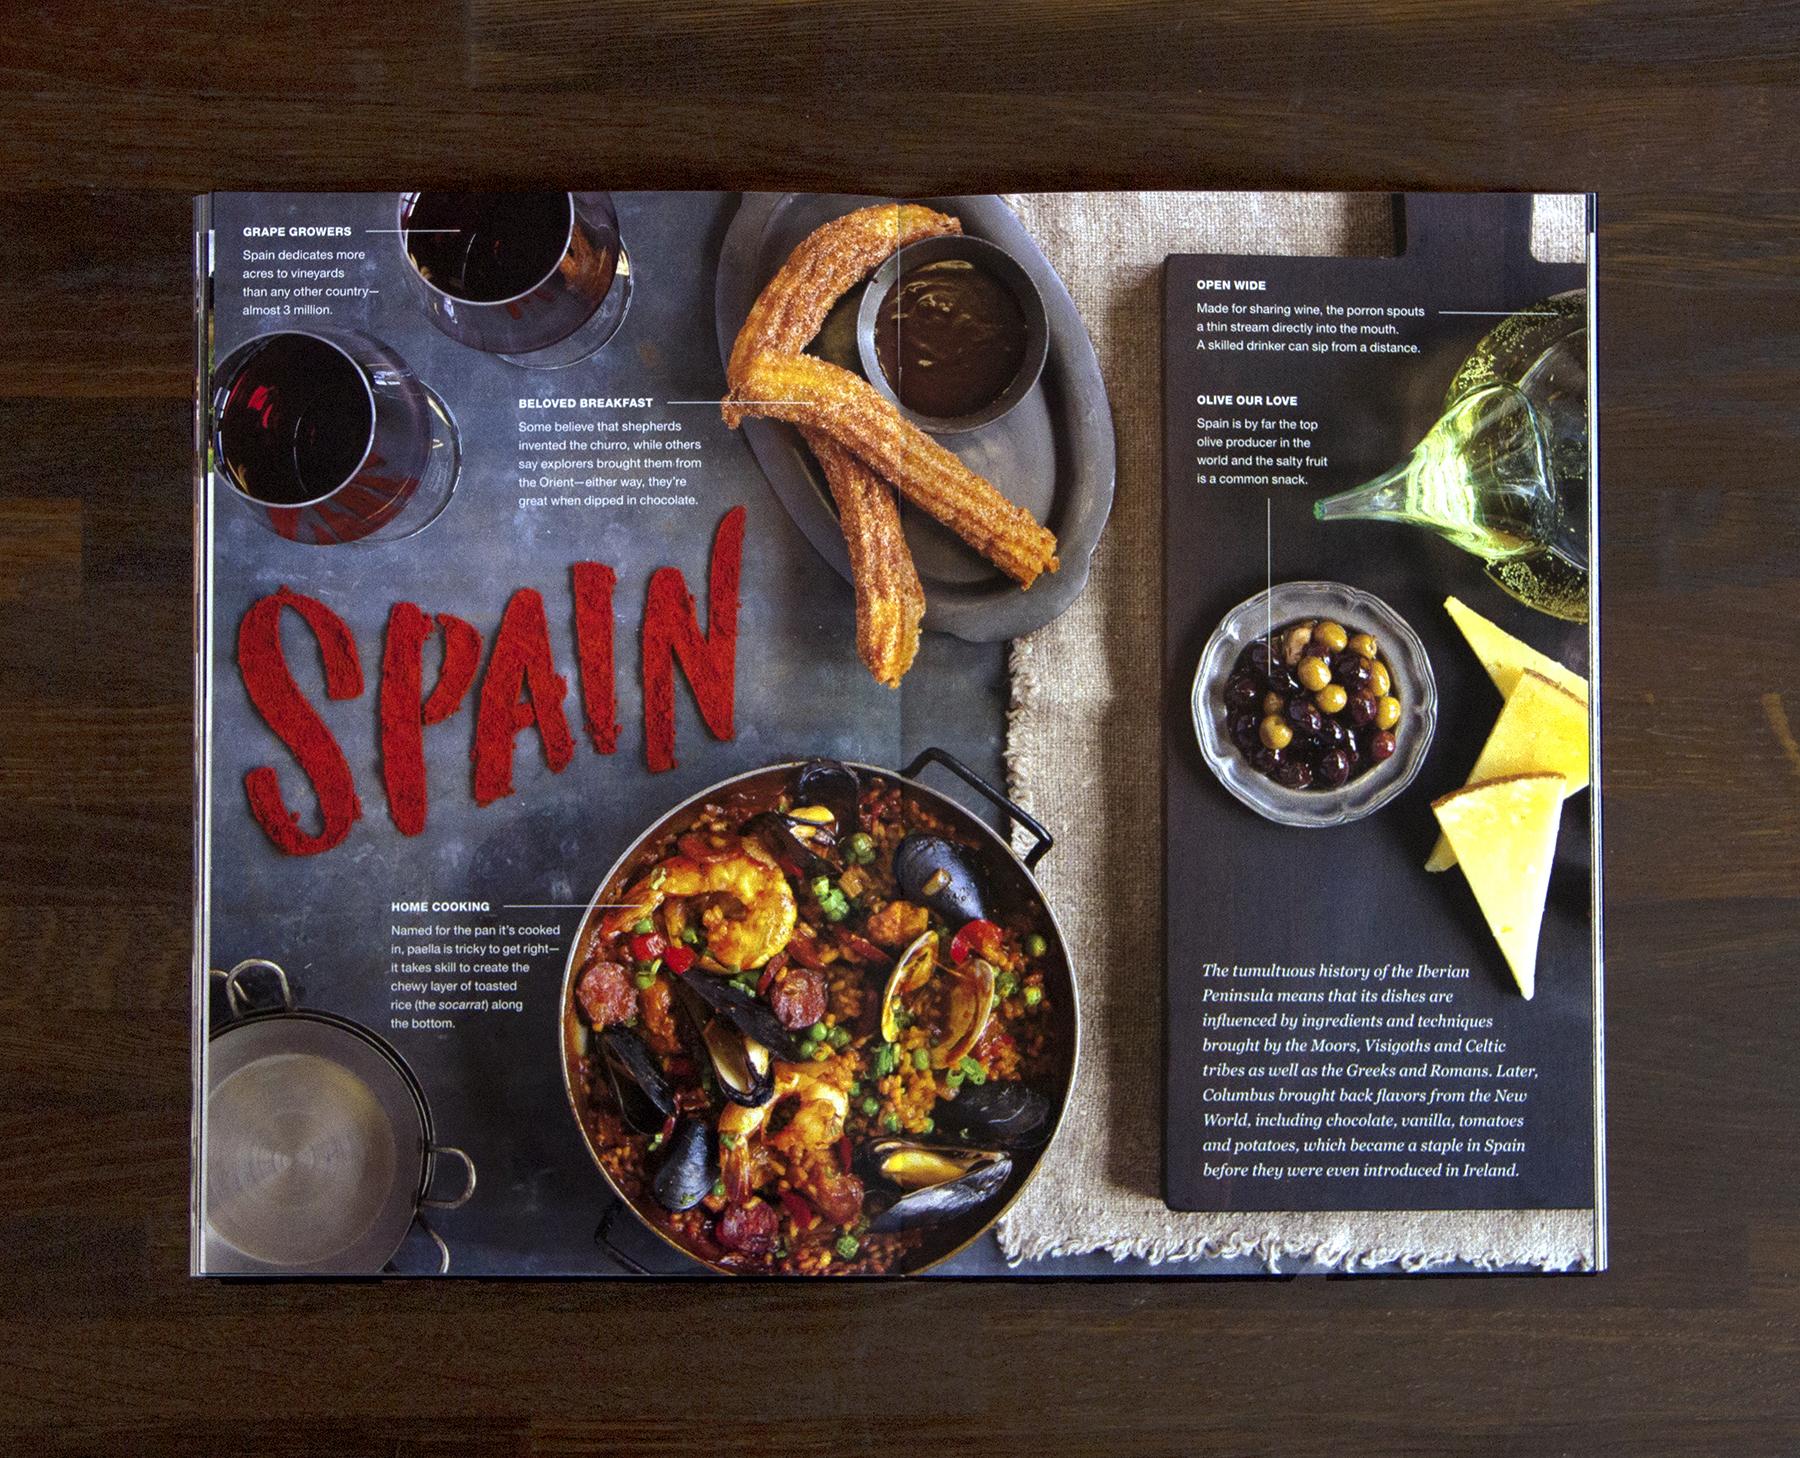 Spain tabletop spread (click to enlarge)